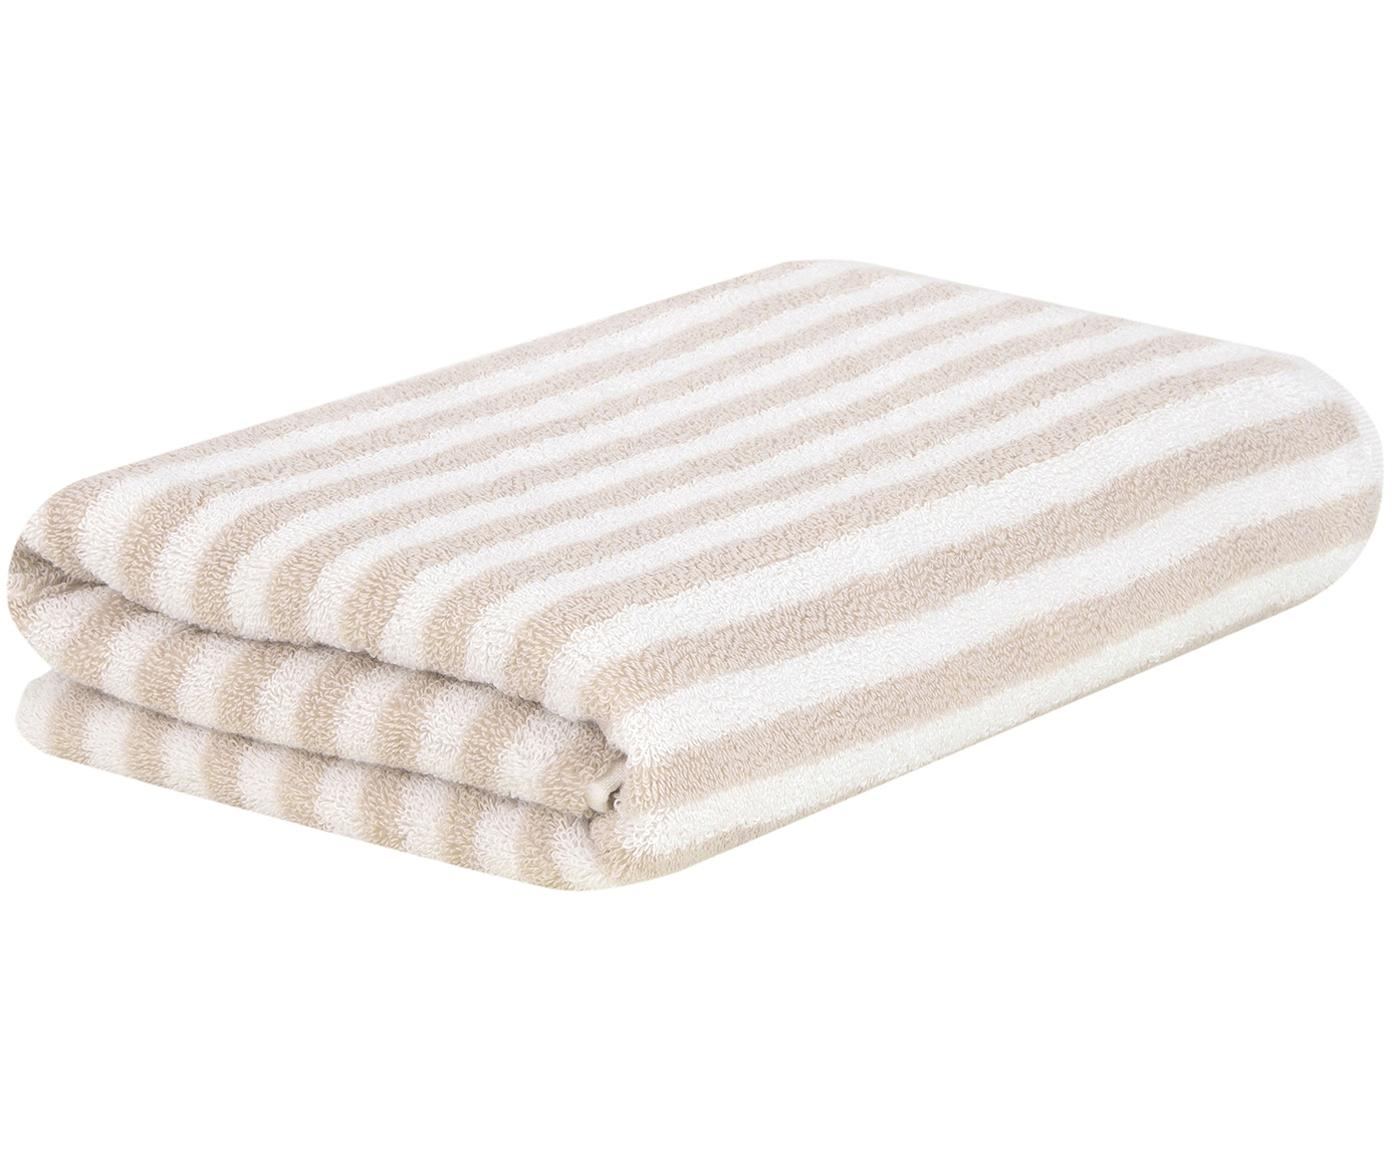 Asciugamano a righe Viola, Sabbia, bianco crema, Asciugamano